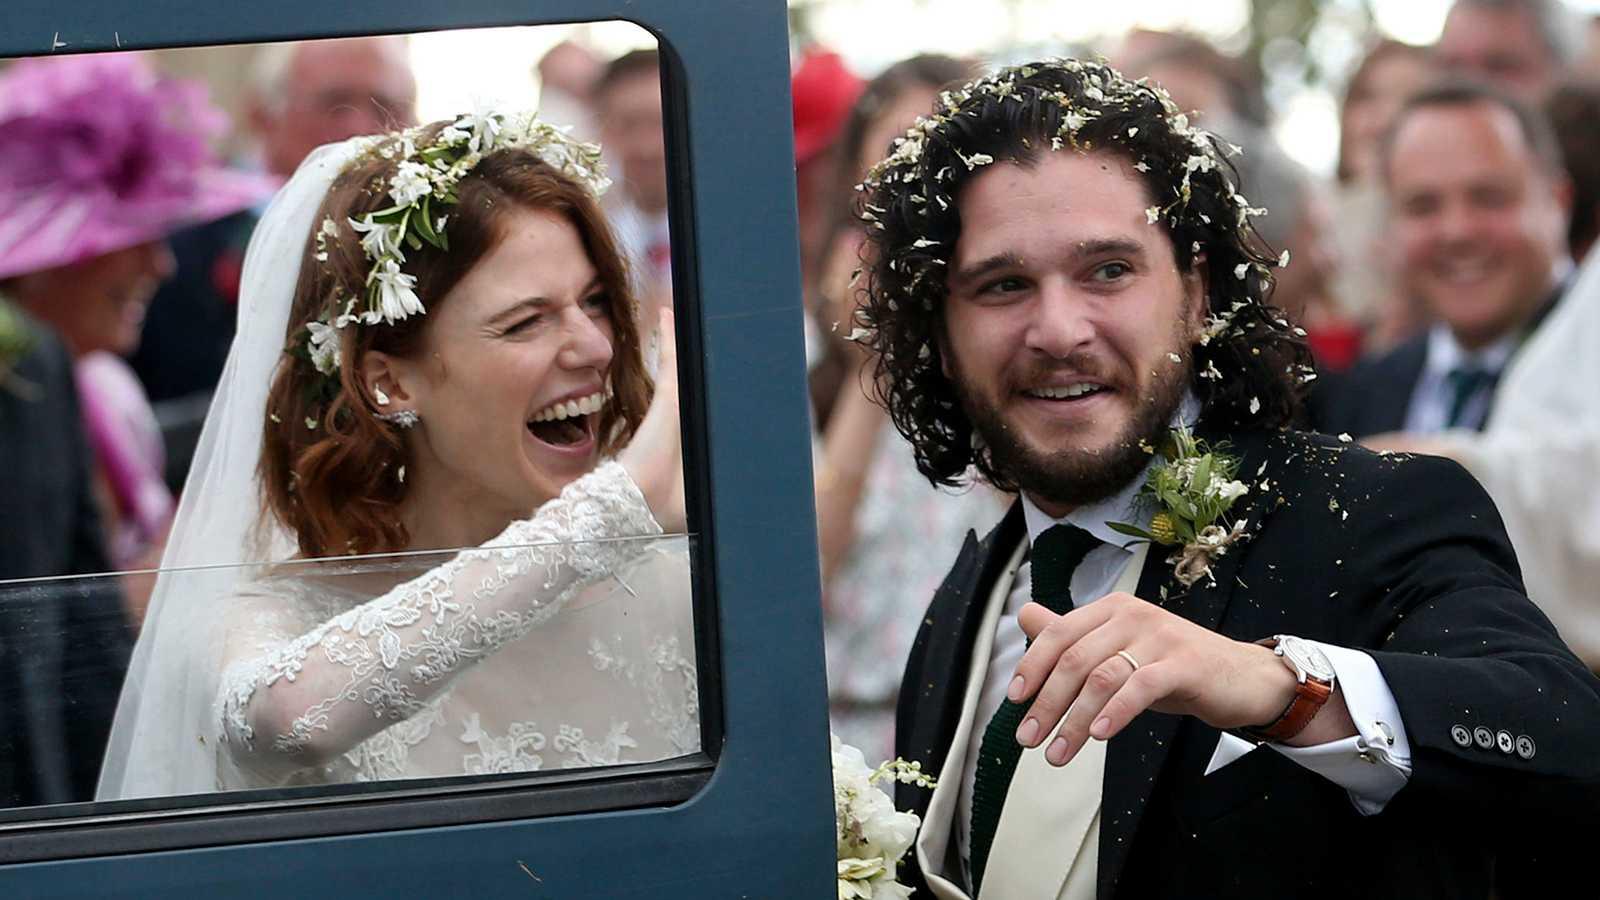 De gifte sig i Skottland 2018.